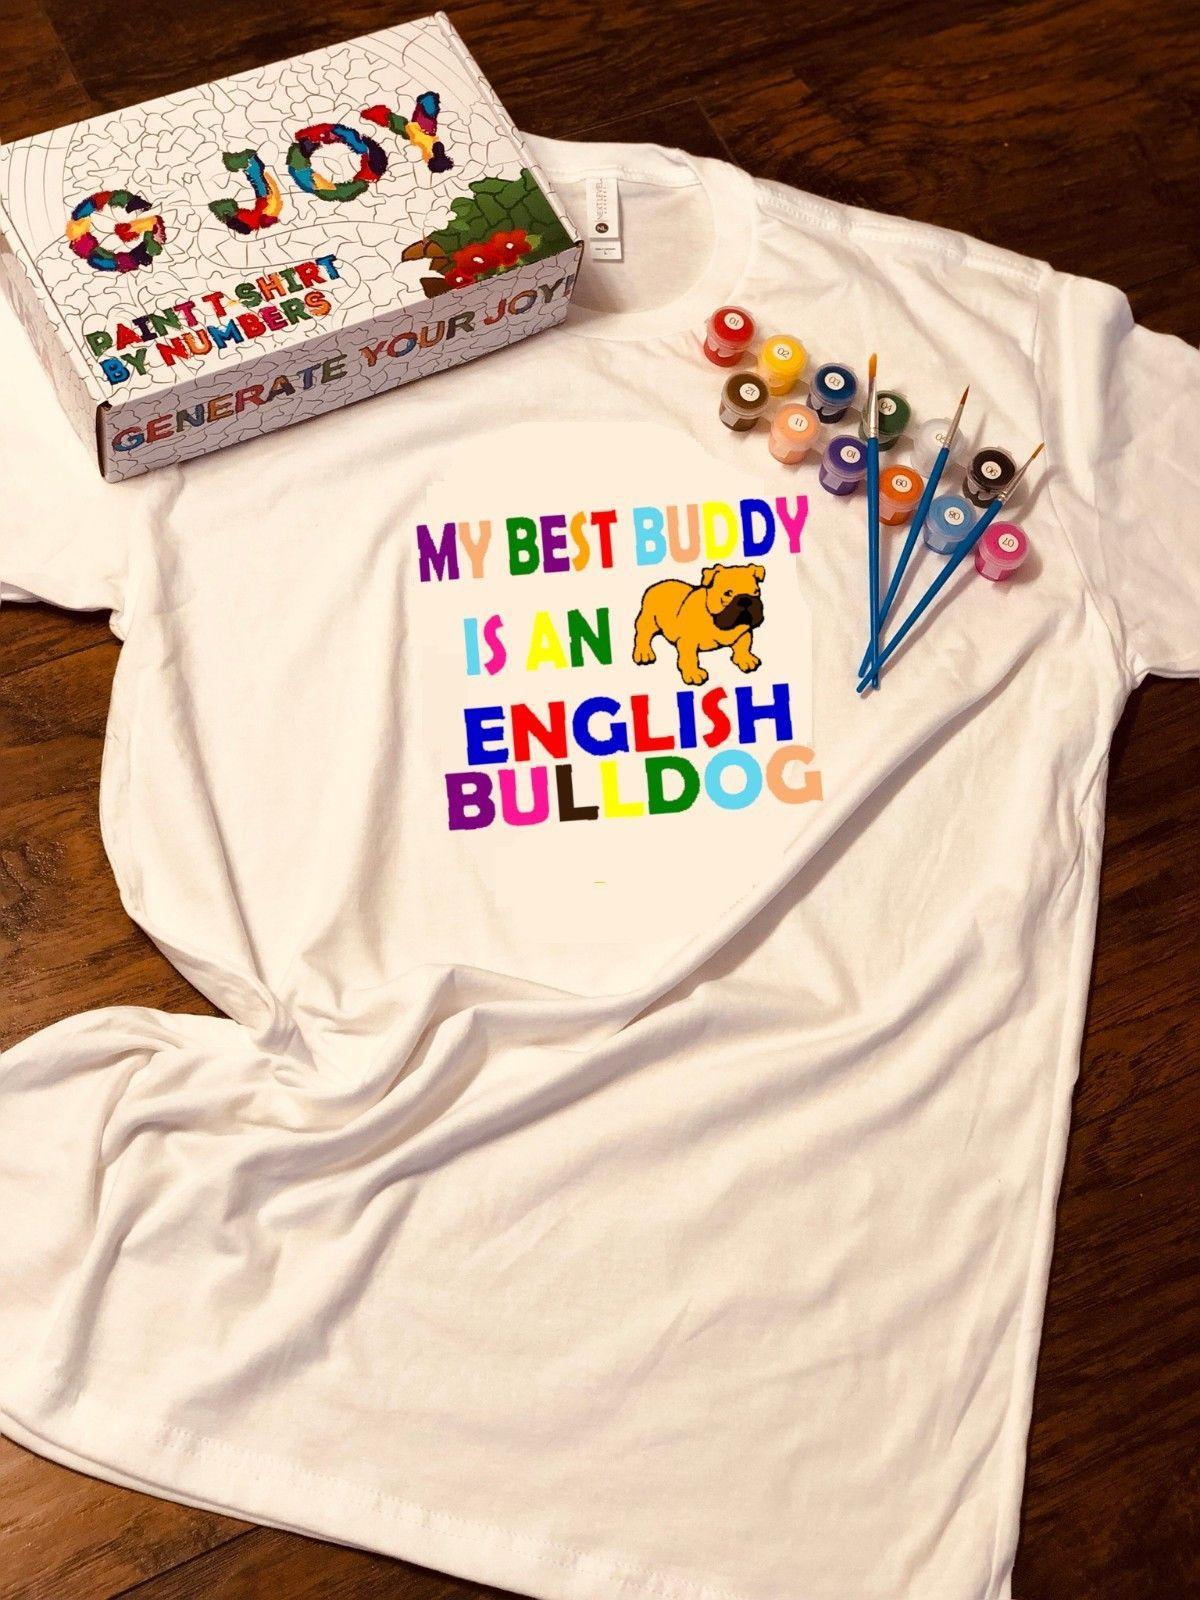 42408bff Christmas Gift Handmade DIY Kit T Shirt Next Level Acrylic Paint Brushes  BulldogMen Women Unisex Fashion Tshirt Vintage Tee Shirts Family T Shirts  From ...